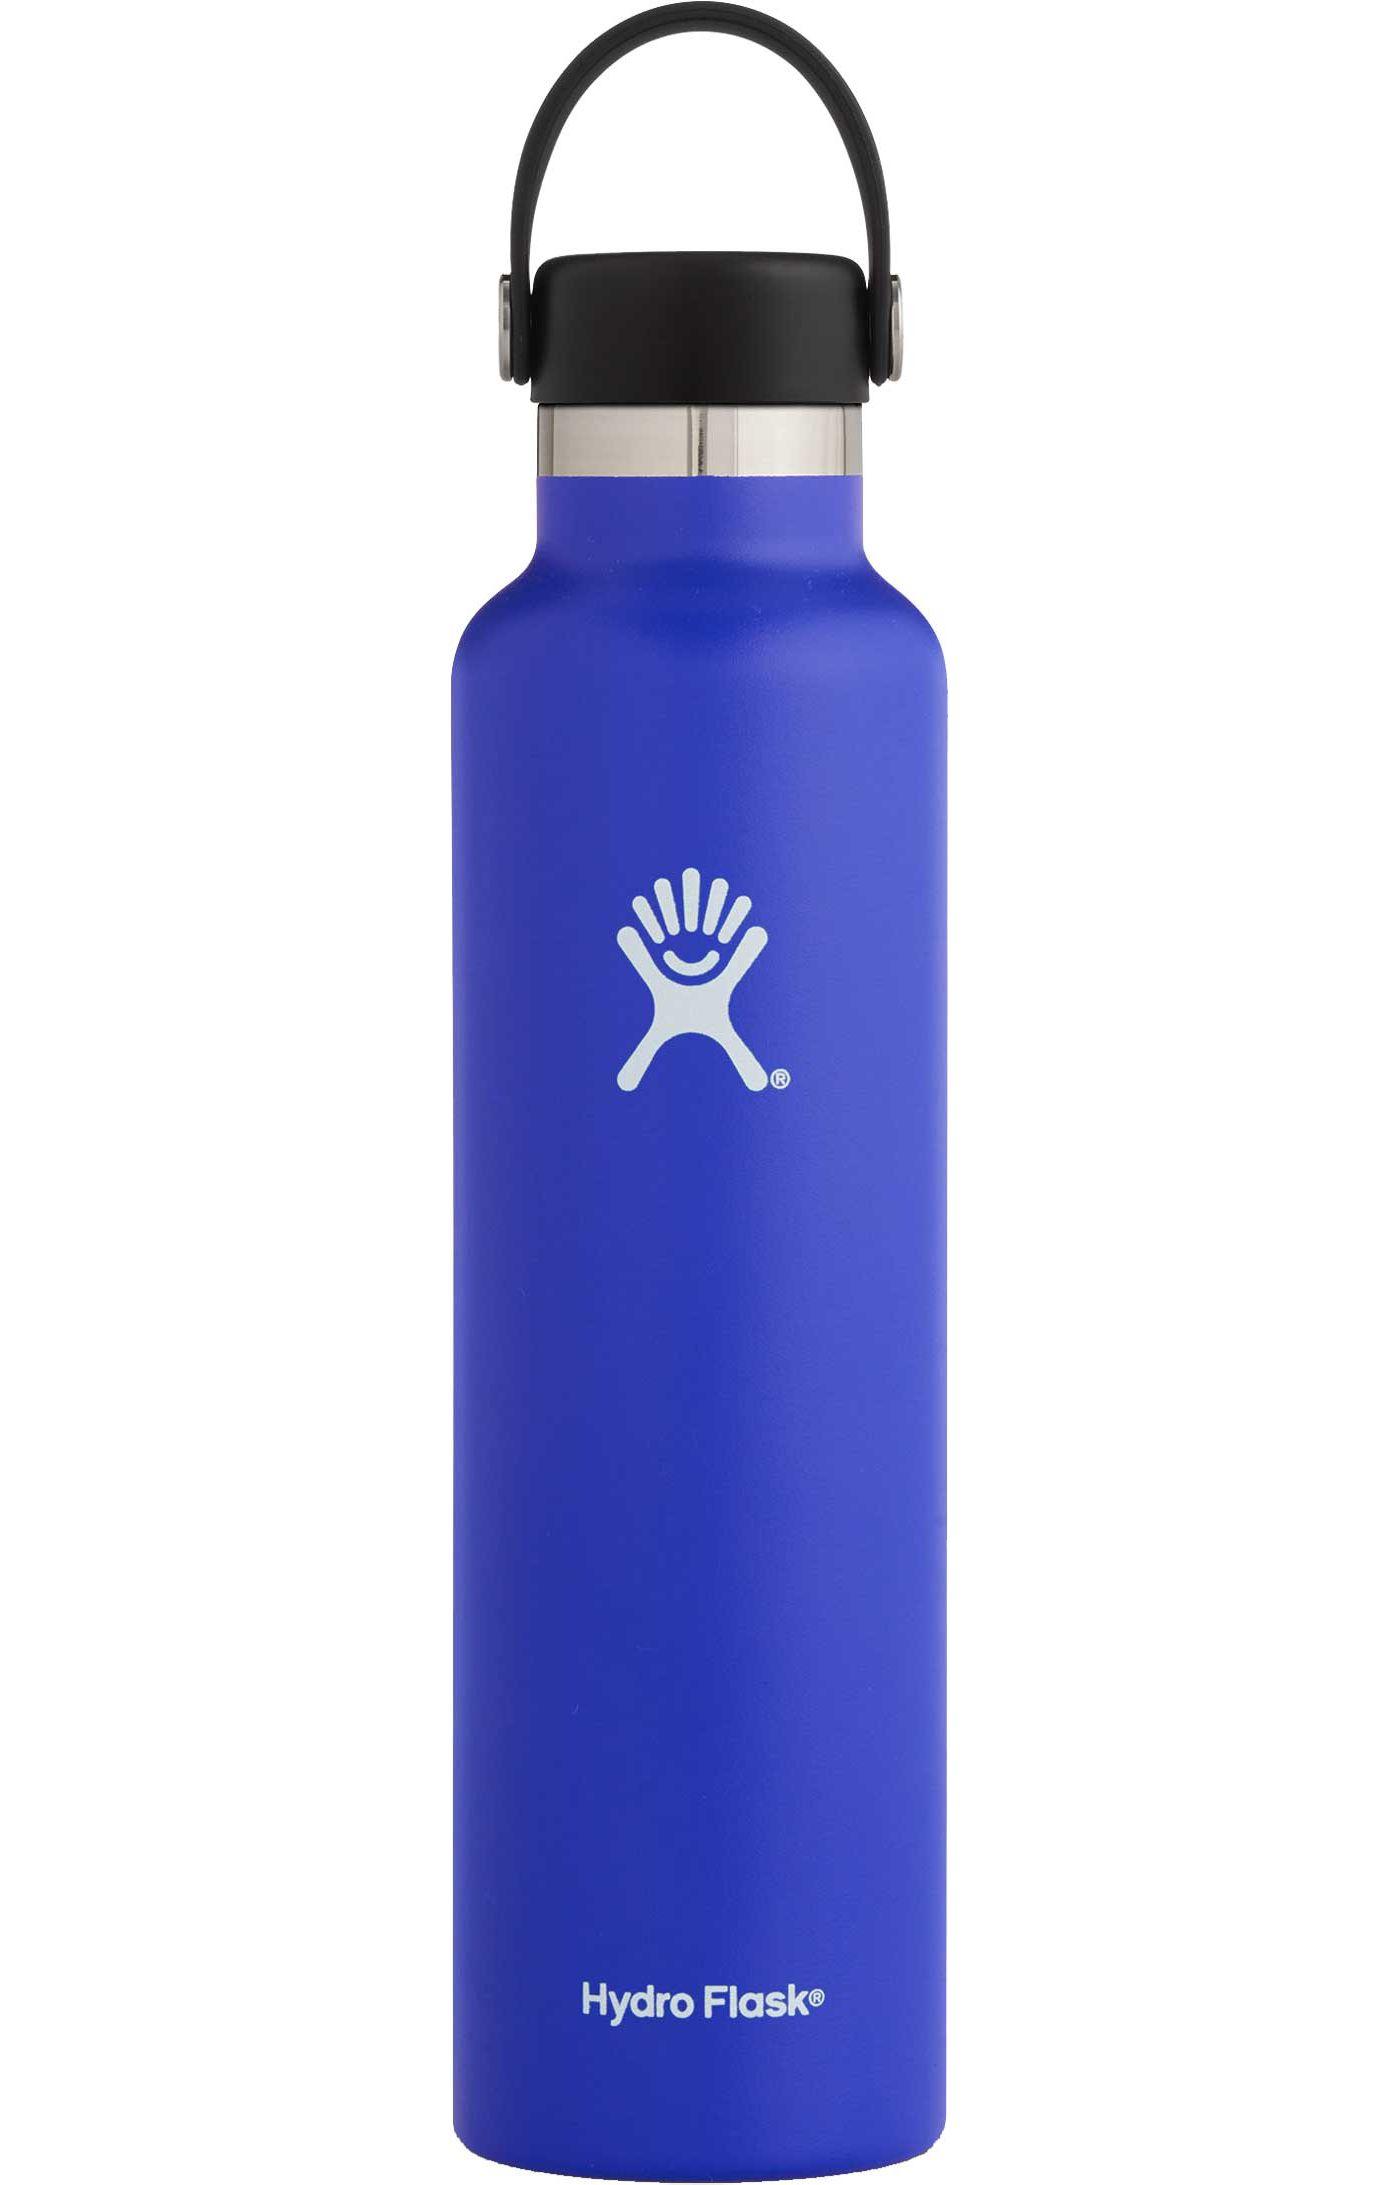 Hydro Flask 24 oz Standard Mouth Bottle